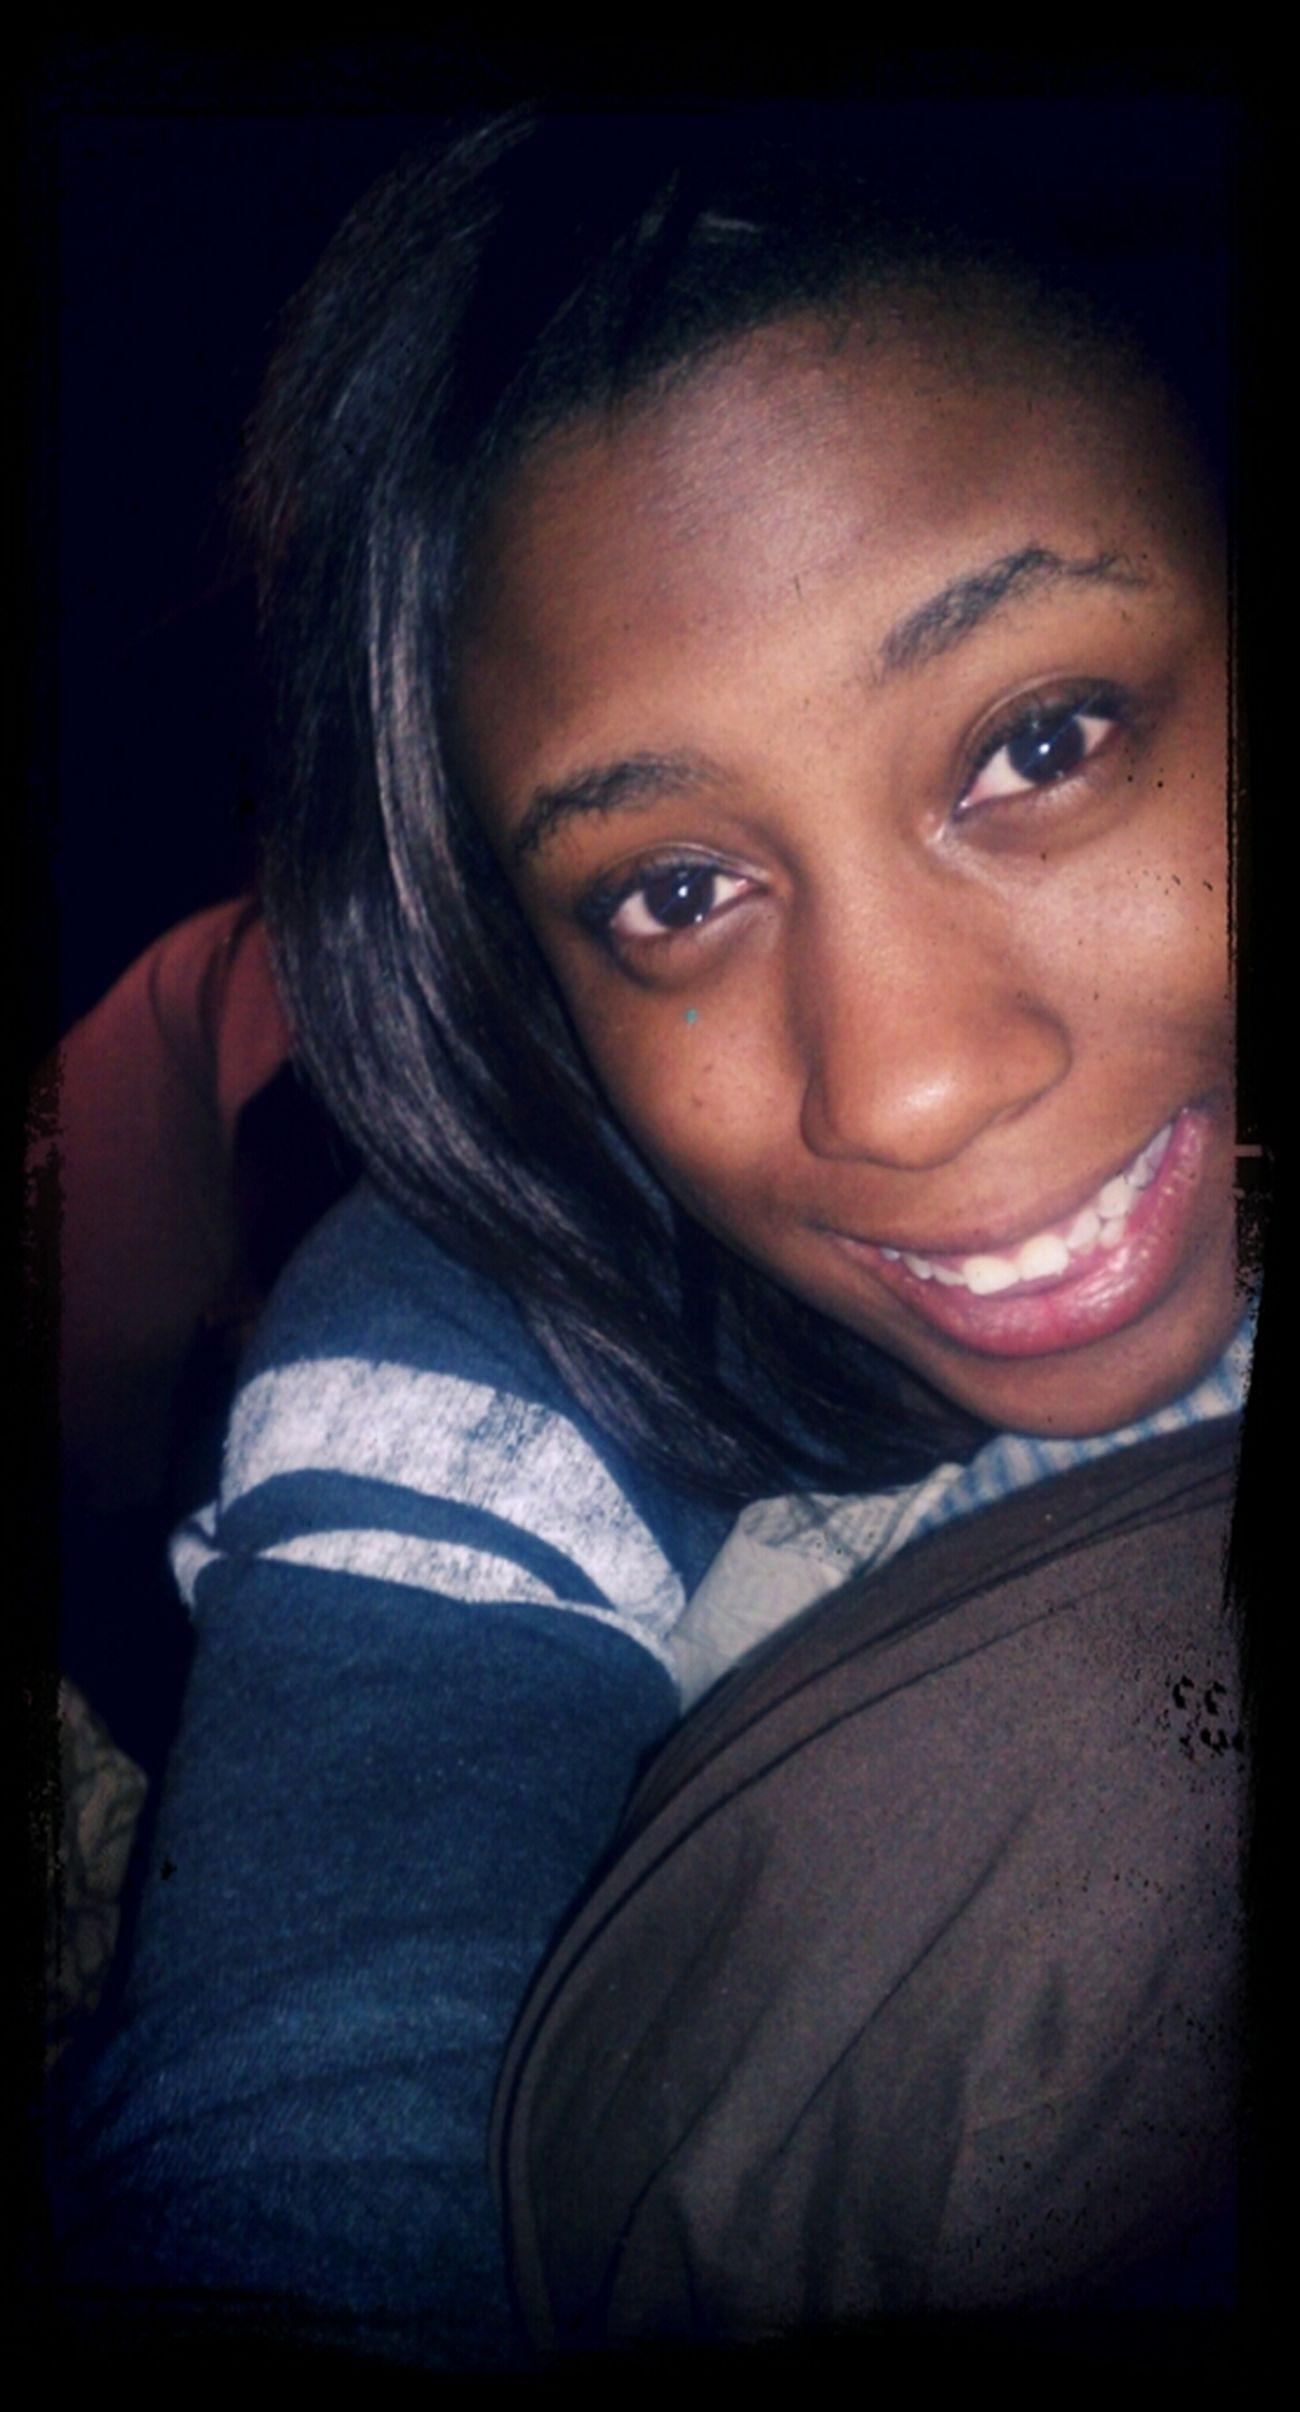 I Look Like A Baby . :/